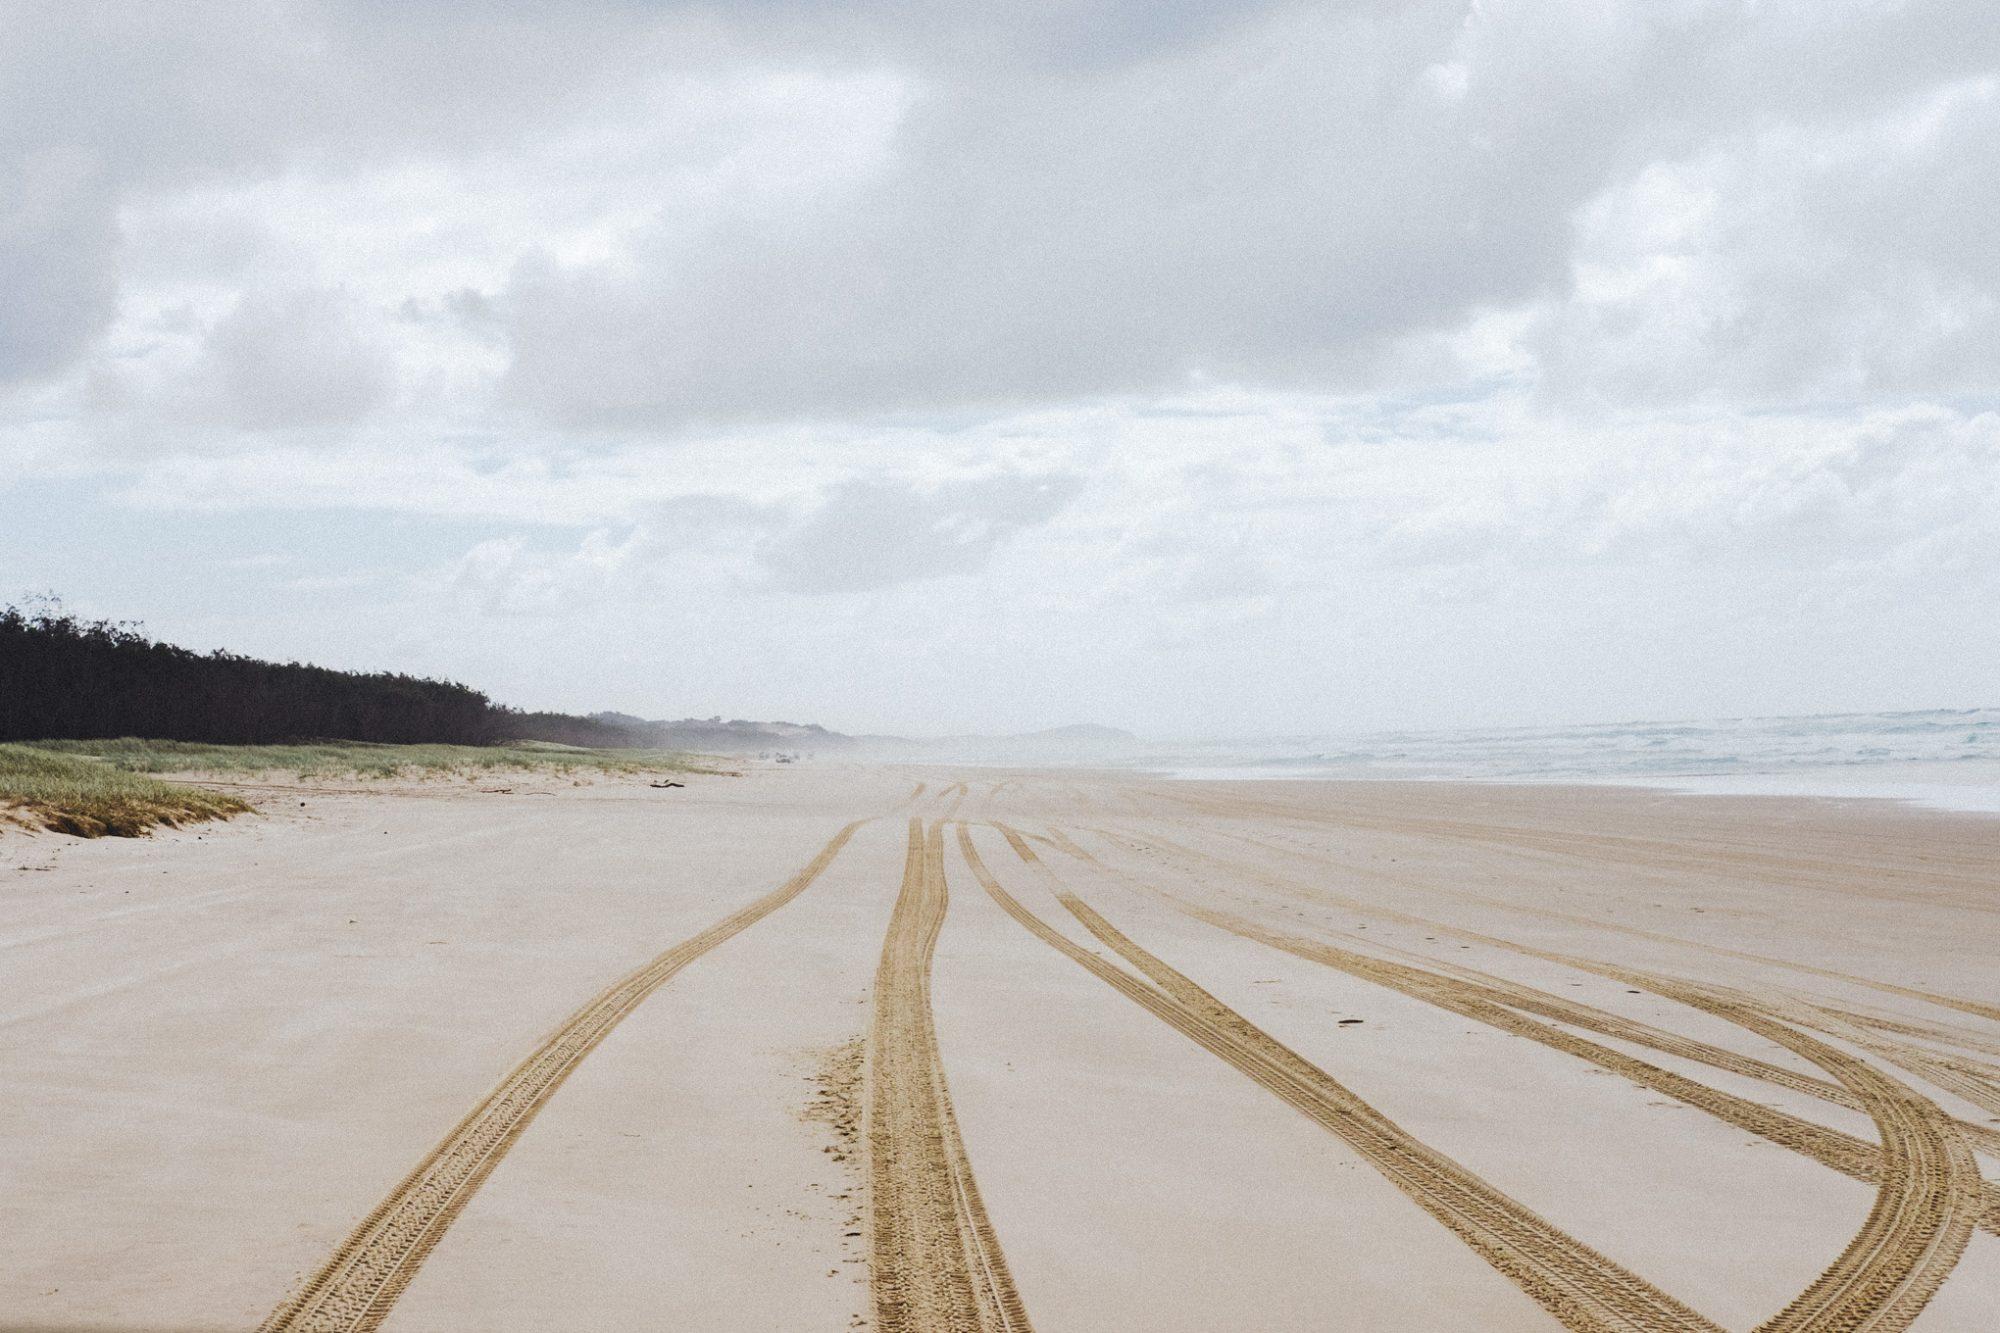 Moreton Island 4x4 Australia Road Trip